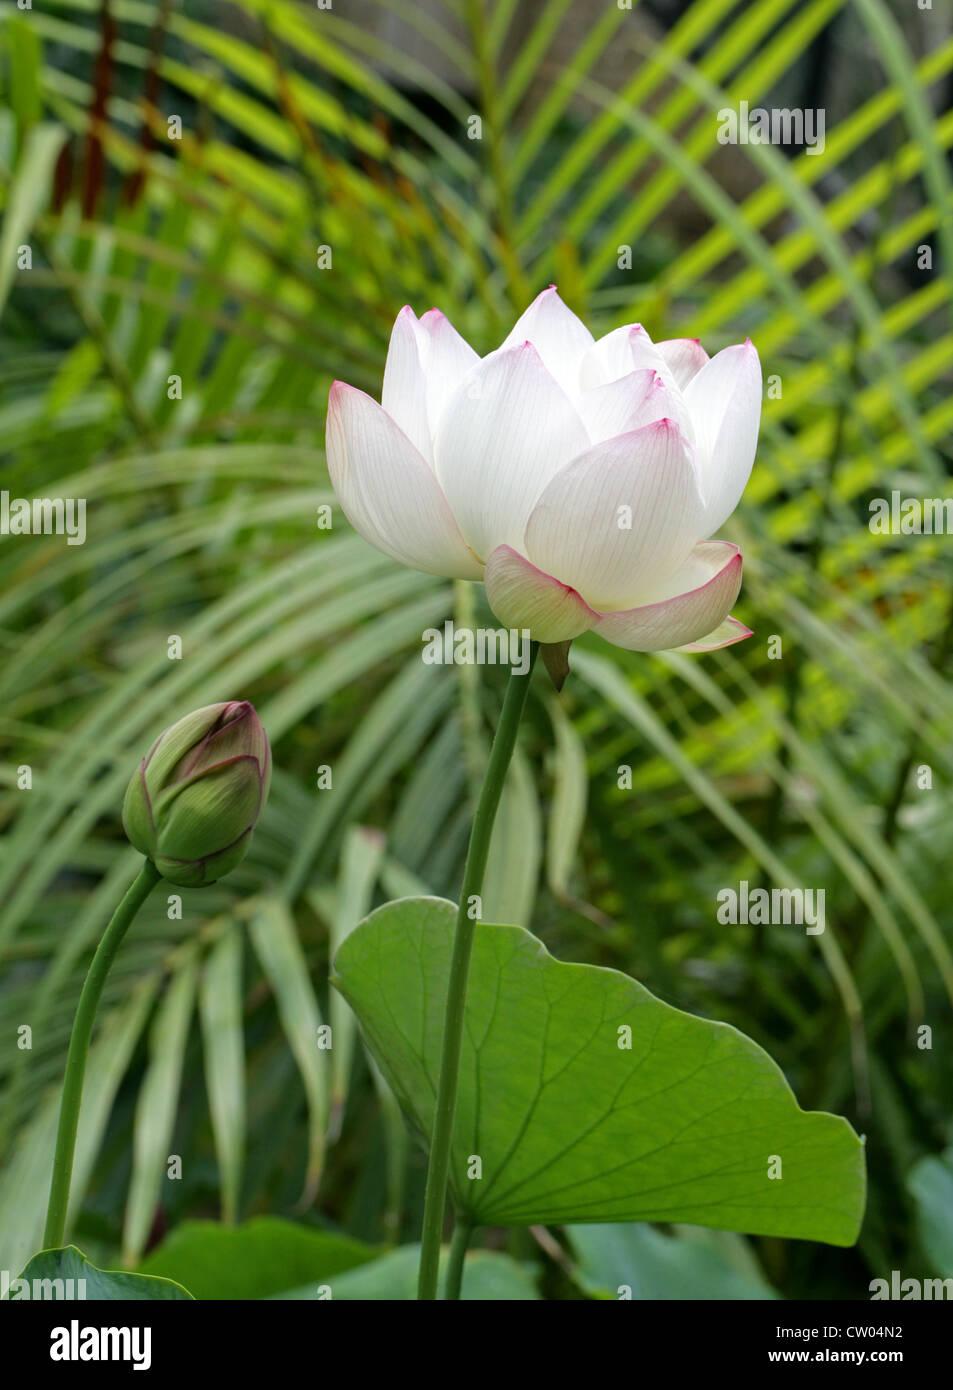 Nelumbo nucifera stock photos nelumbo nucifera stock images alamy indian lotus sacred lotus bean of india or sacred waterlily nelumbo nucifera izmirmasajfo Choice Image